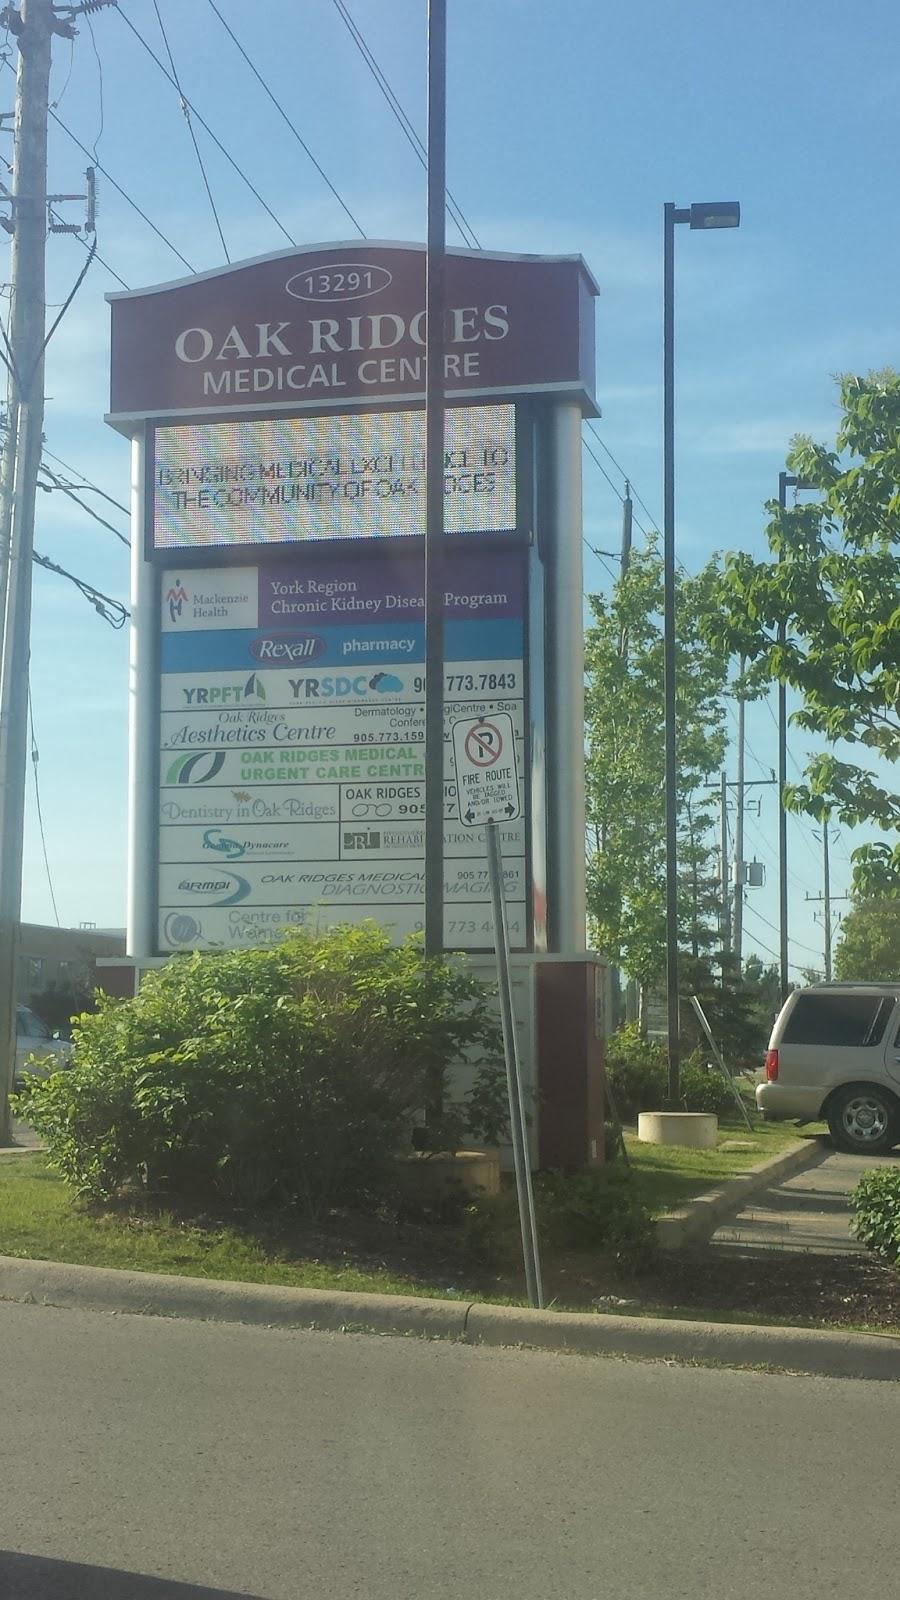 Dynacare Laboratory and Health Services Centre | health | 13291 Yonge St #103, Richmond Hill, ON L4E 4L6, Canada | 9057737936 OR +1 905-773-7936